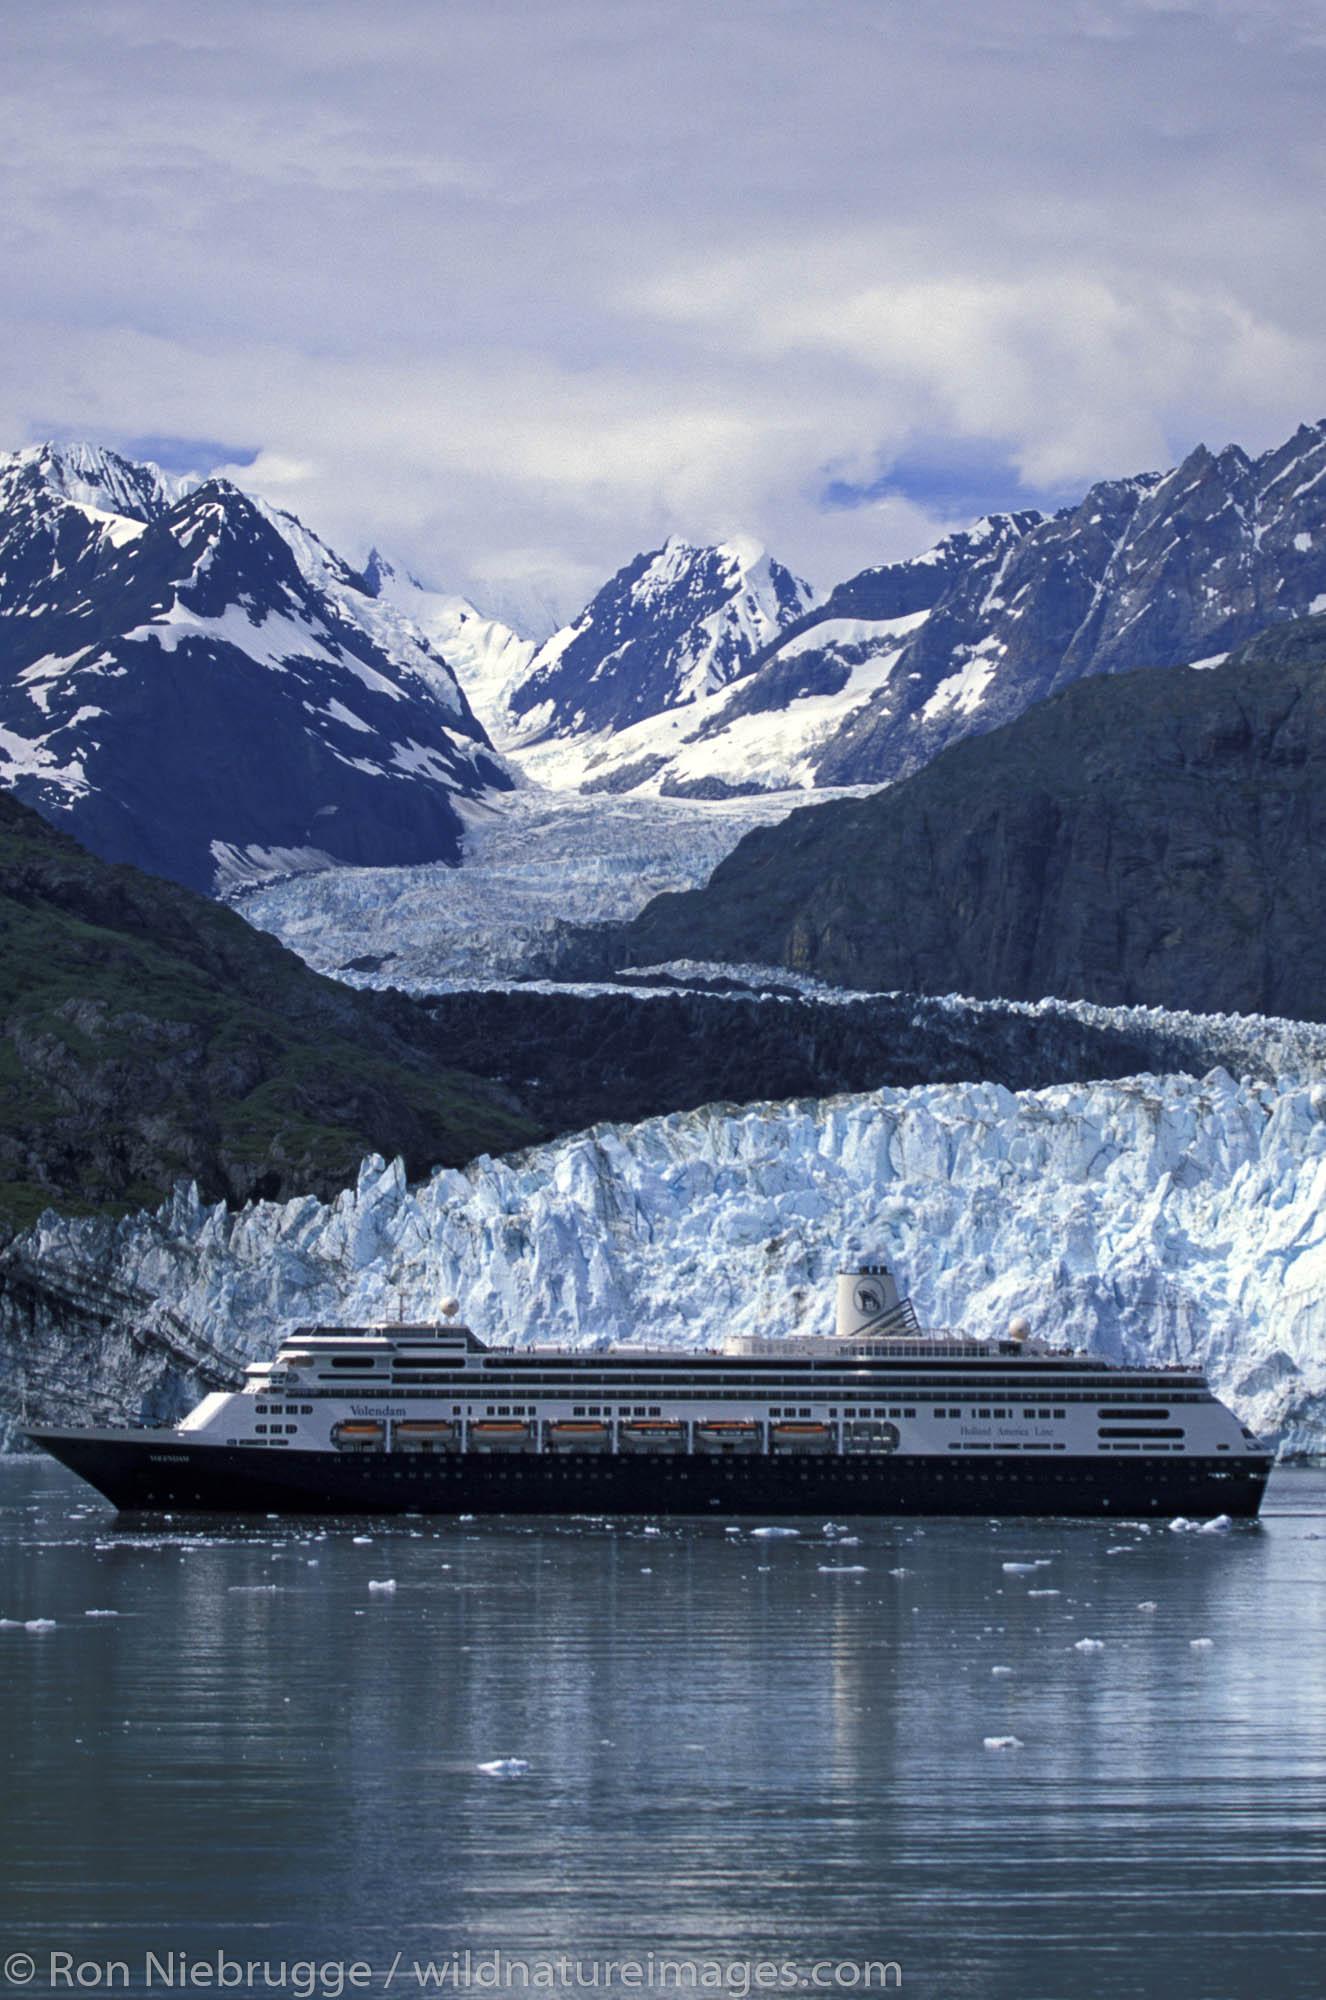 Holland America Cruise Ship Volendam at Margerie Glacier in Glacier Bay National Park, Alaska.